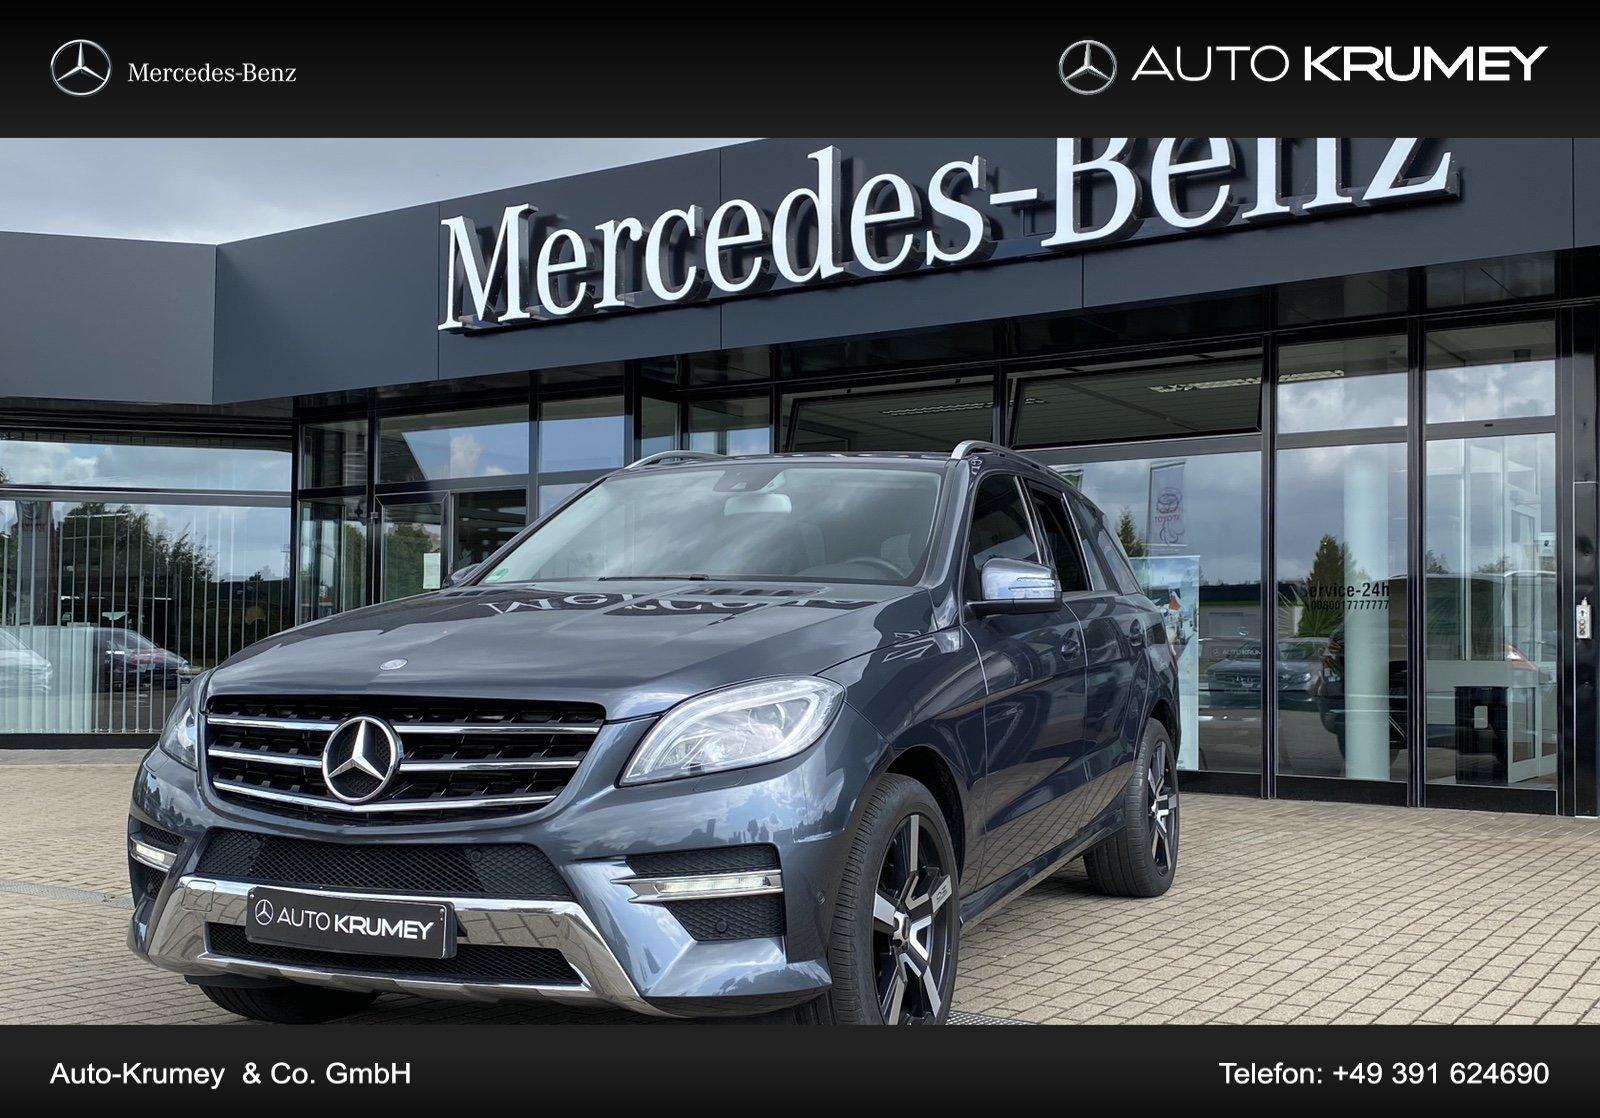 Mercedes-Benz ML 350 CDI BlueTec COMAND,Airmatic,LED,AMG Klima, Jahr 2012, Diesel